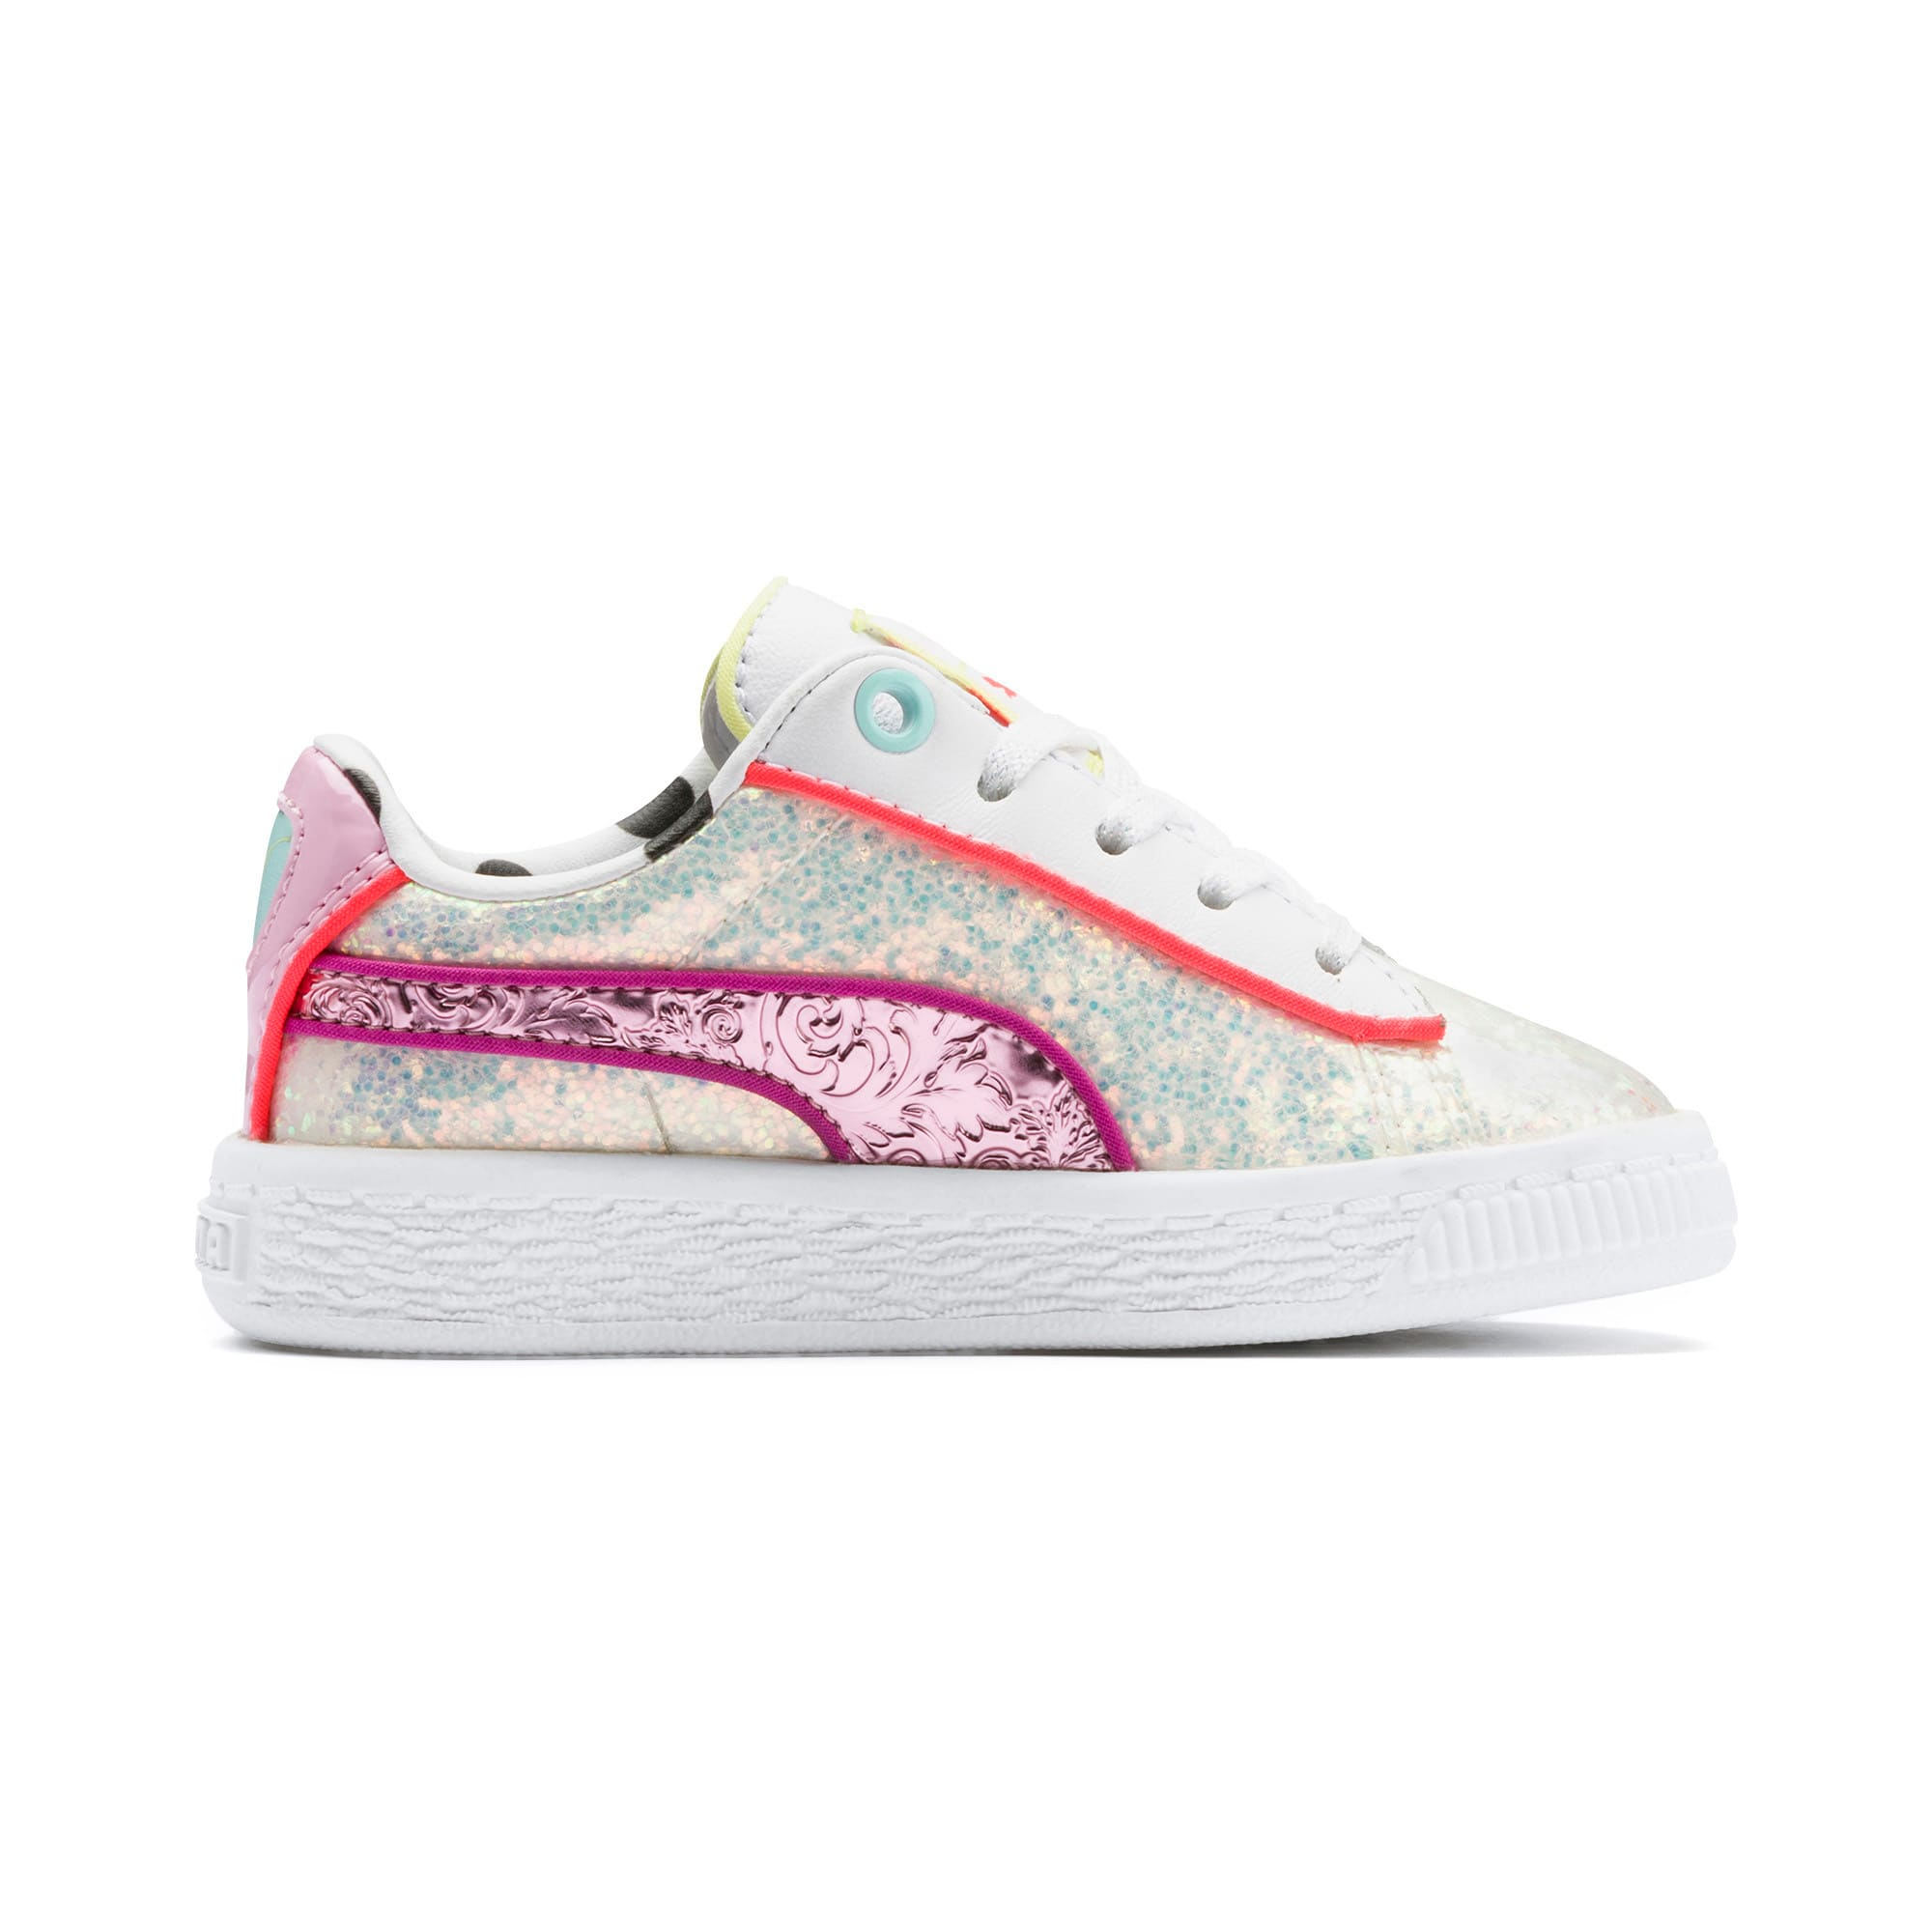 Thumbnail 5 of PUMA x SOPHIA WEBSTER Basket Toddler Shoes, Puma White-Pale Pink, medium